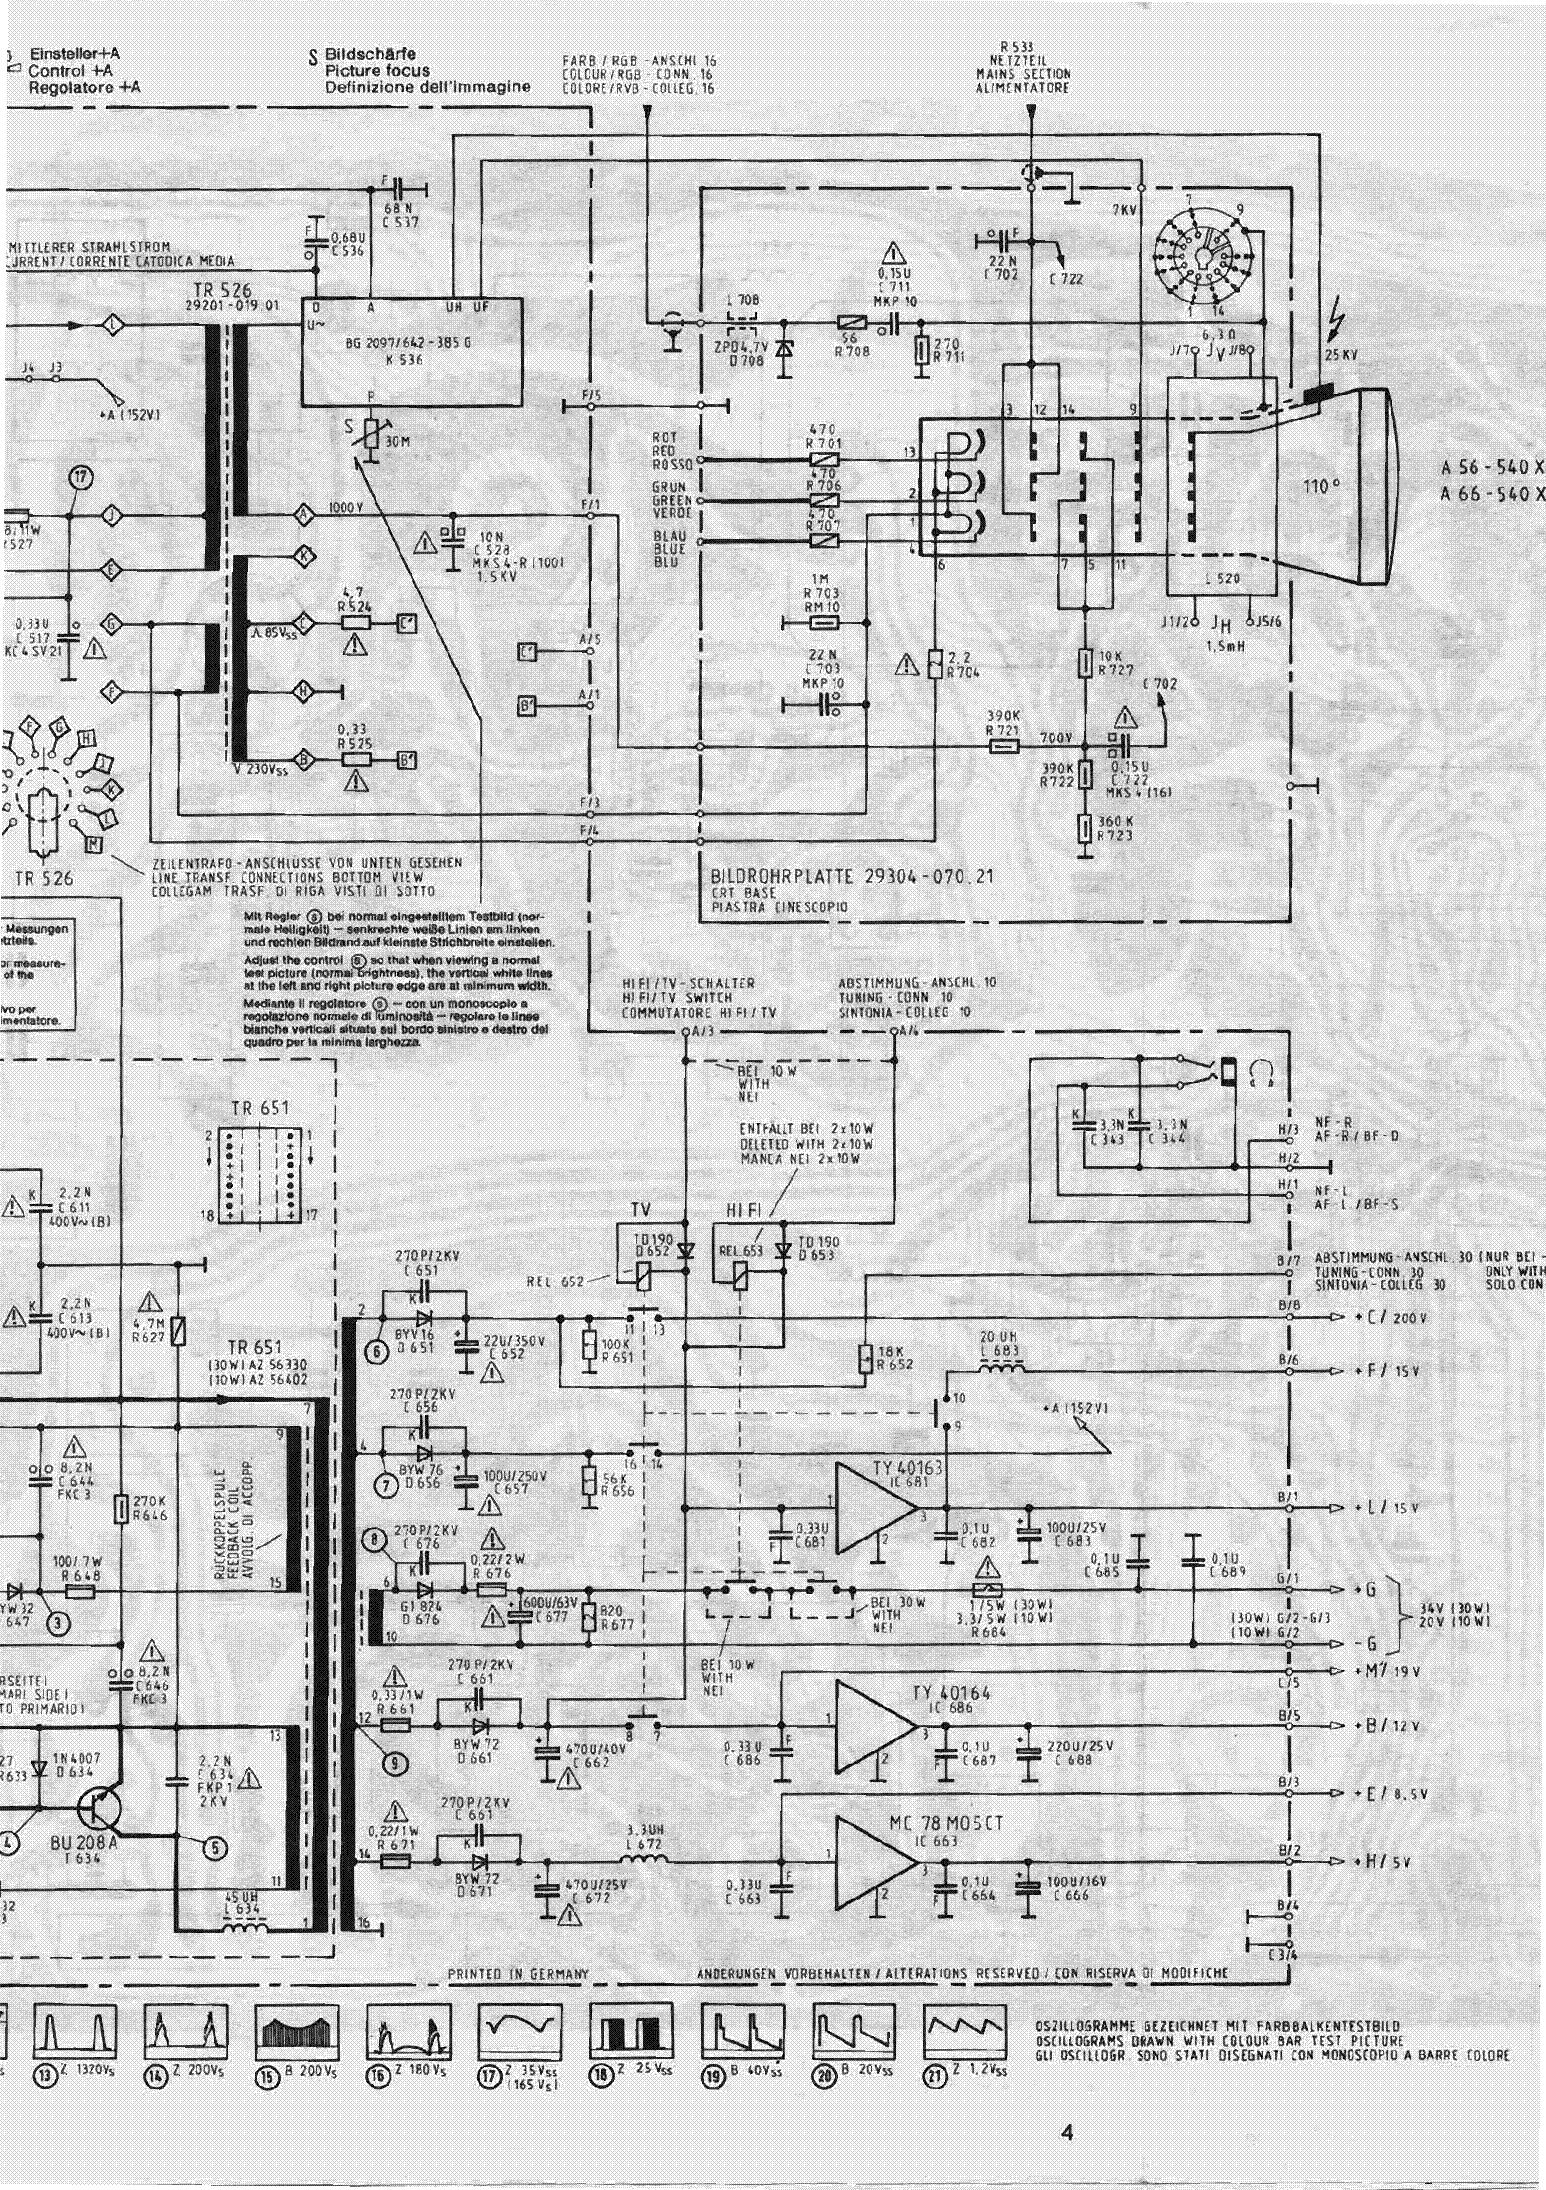 GRUNDIG CUC731,741 service manual (1st page)